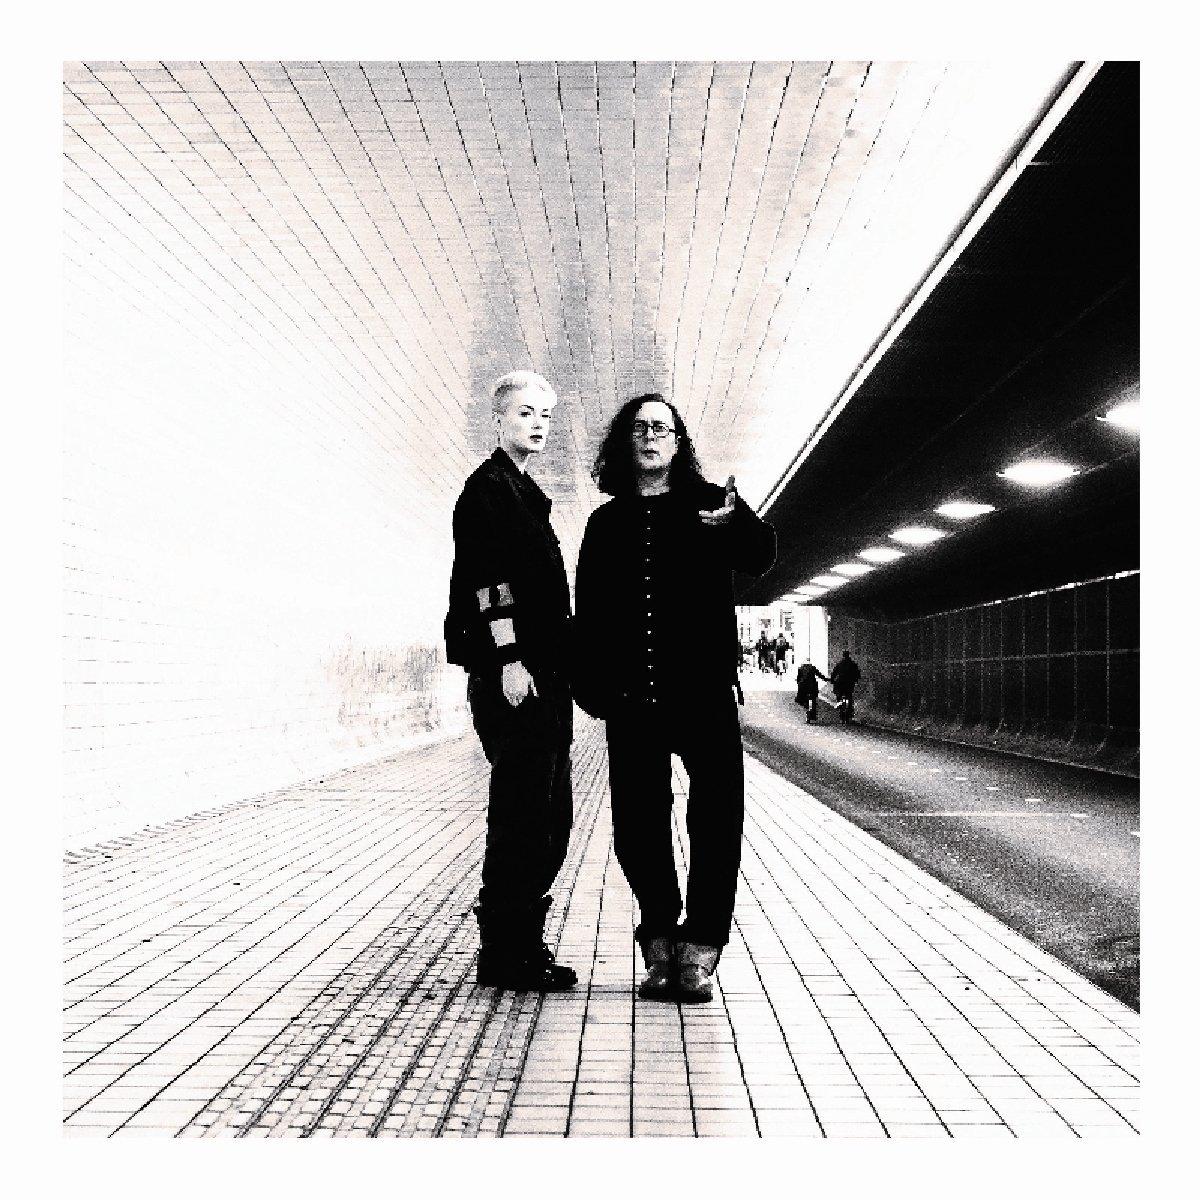 Miles Hunt & Erica Nockalls – We Came Here To Work (Good Deeds Records)